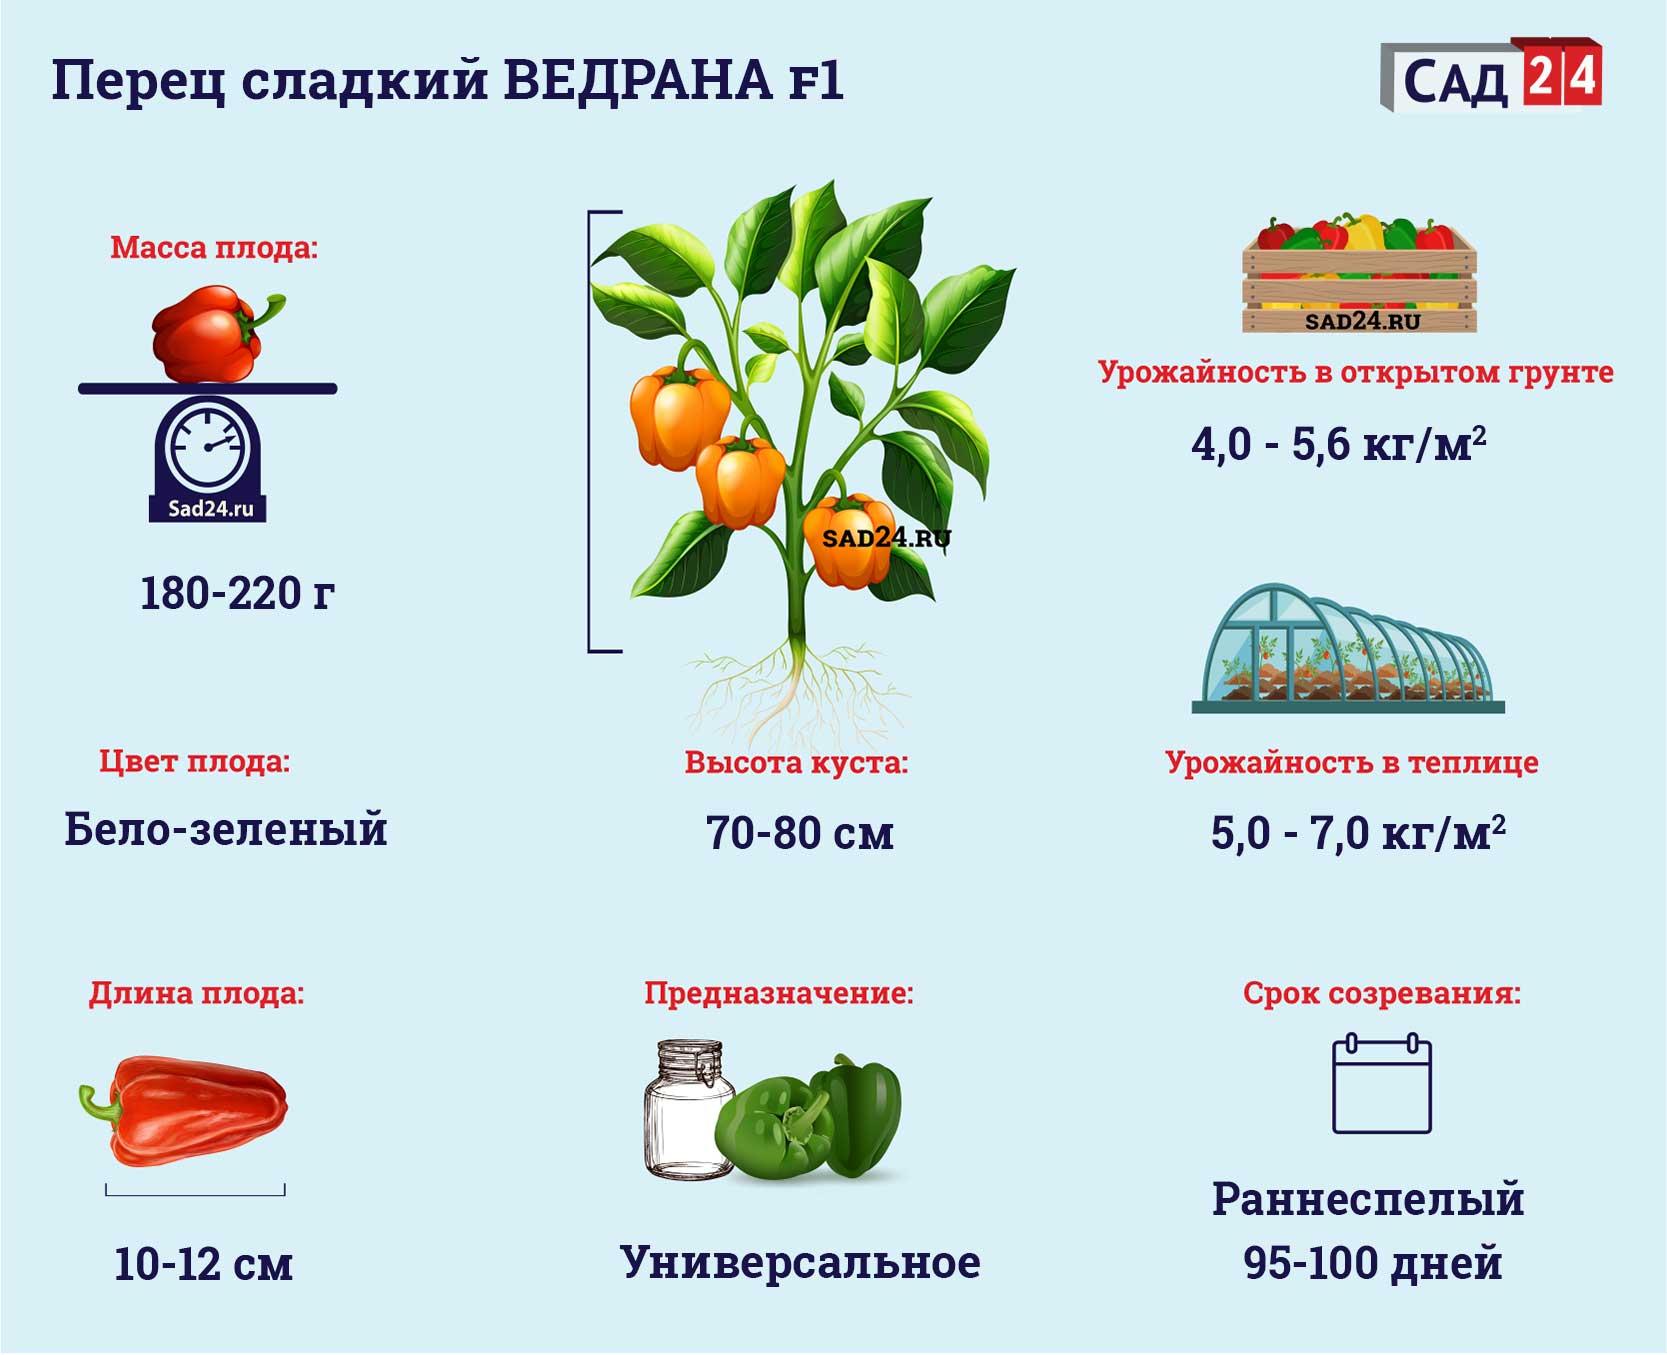 Ведрана - https://sad24.ru